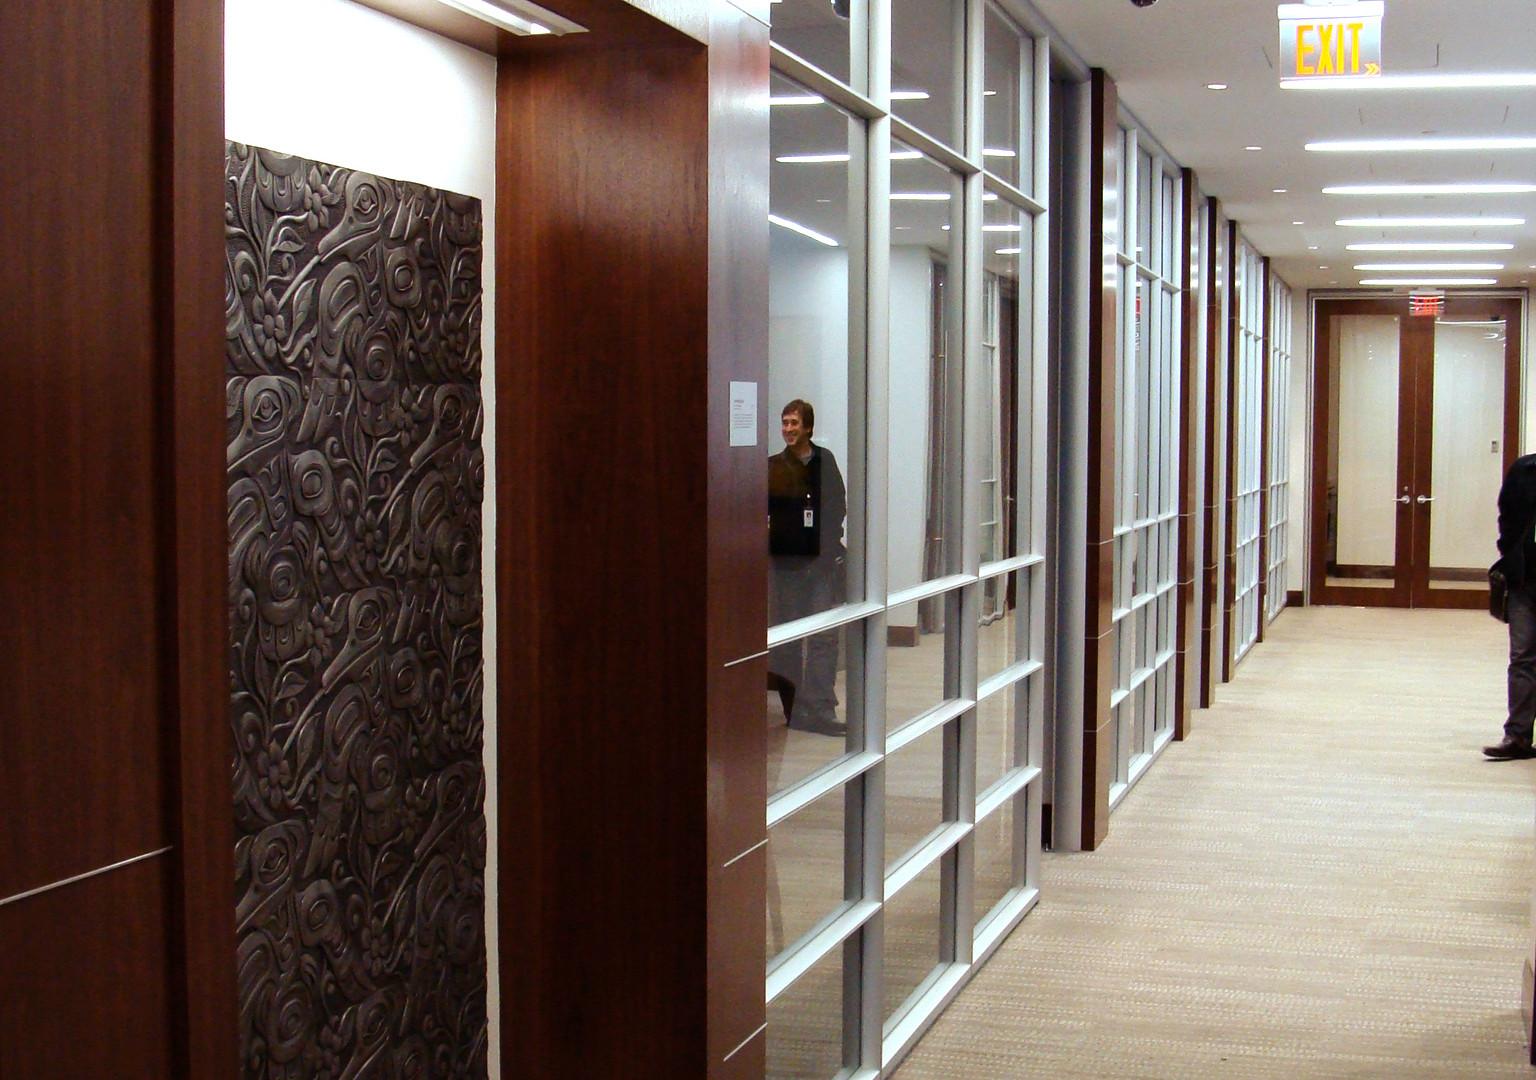 HSBC Executive Office Hall 2